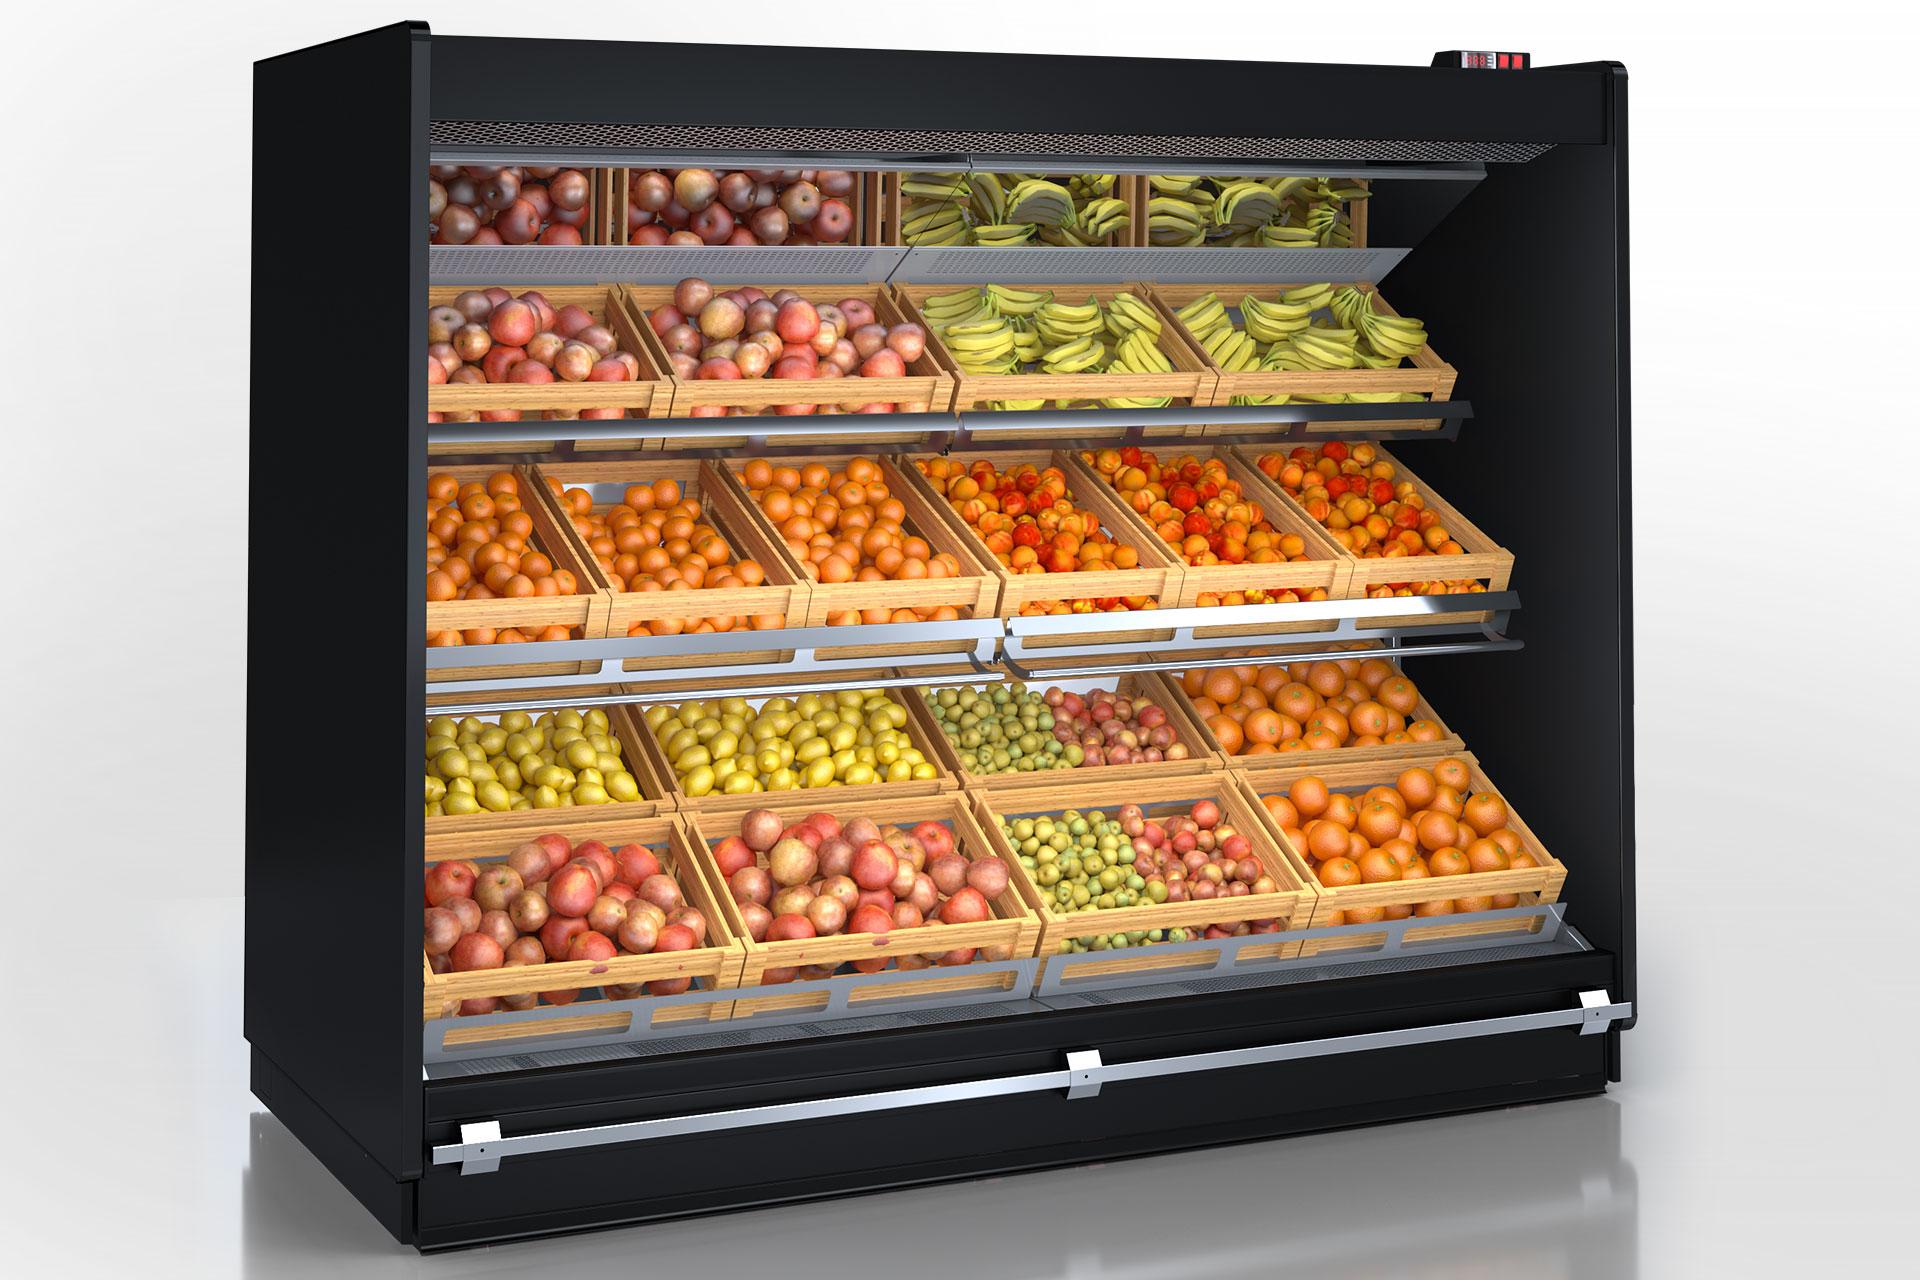 Multideck cabinets Louisiana roll-in VF MV 115 MT O 225-DLM